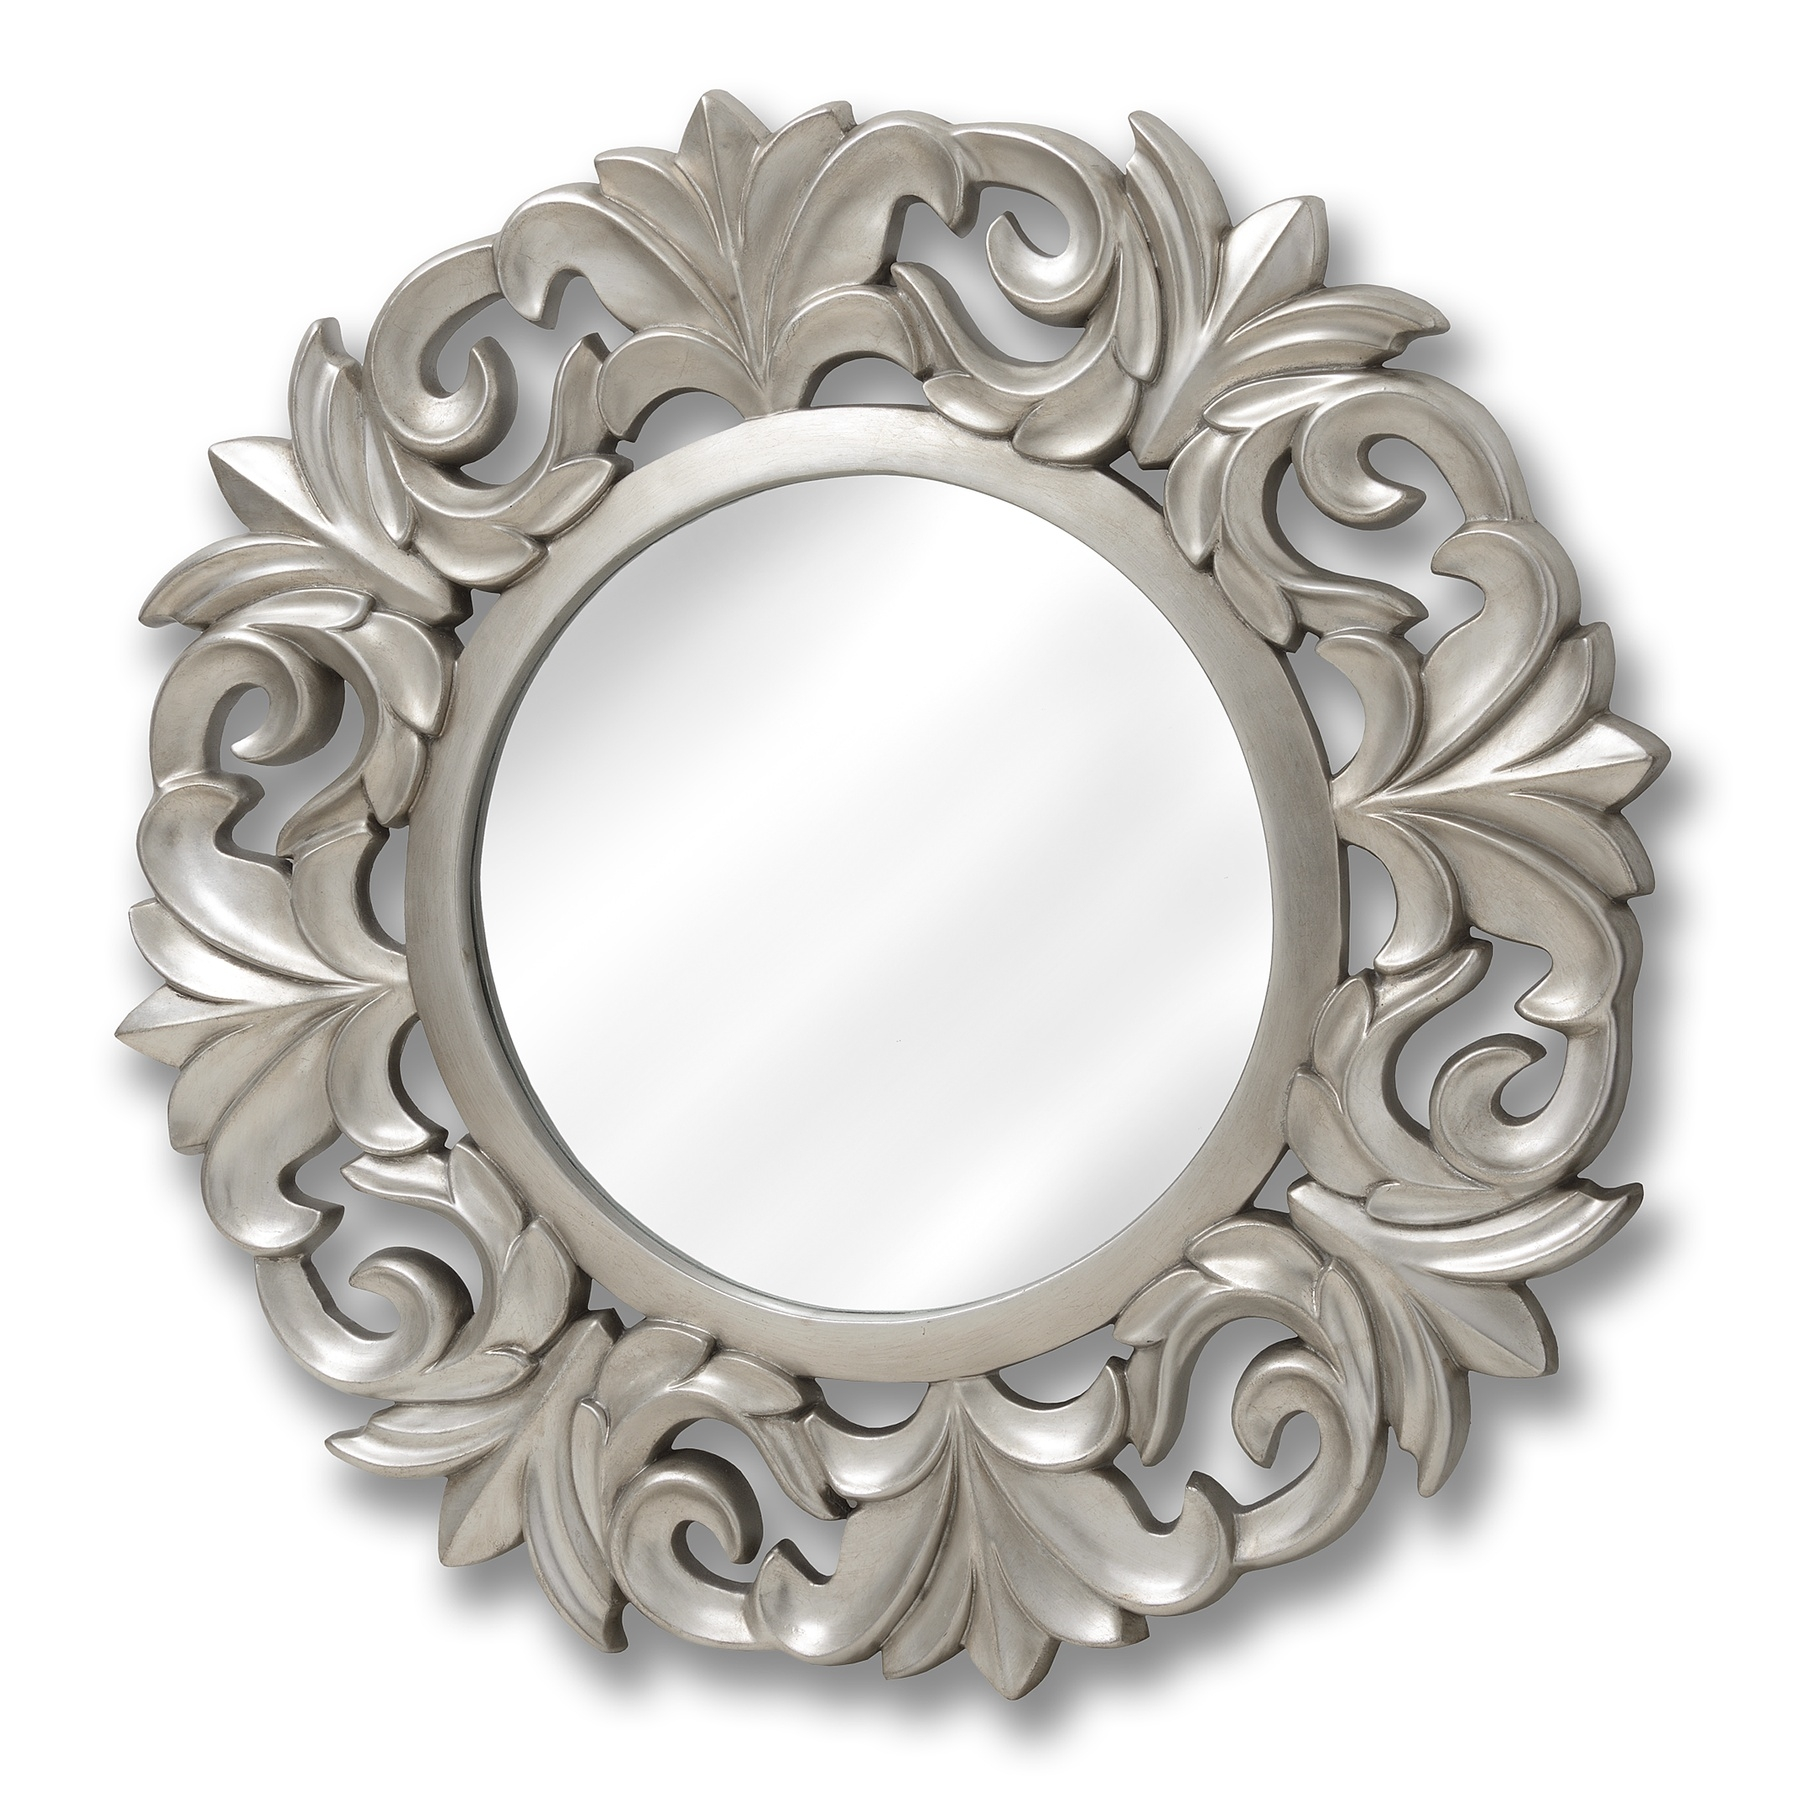 Baroque Style Round Silver Mirror Happy Home Interiors Intended For Round Silver Mirror (Image 1 of 15)